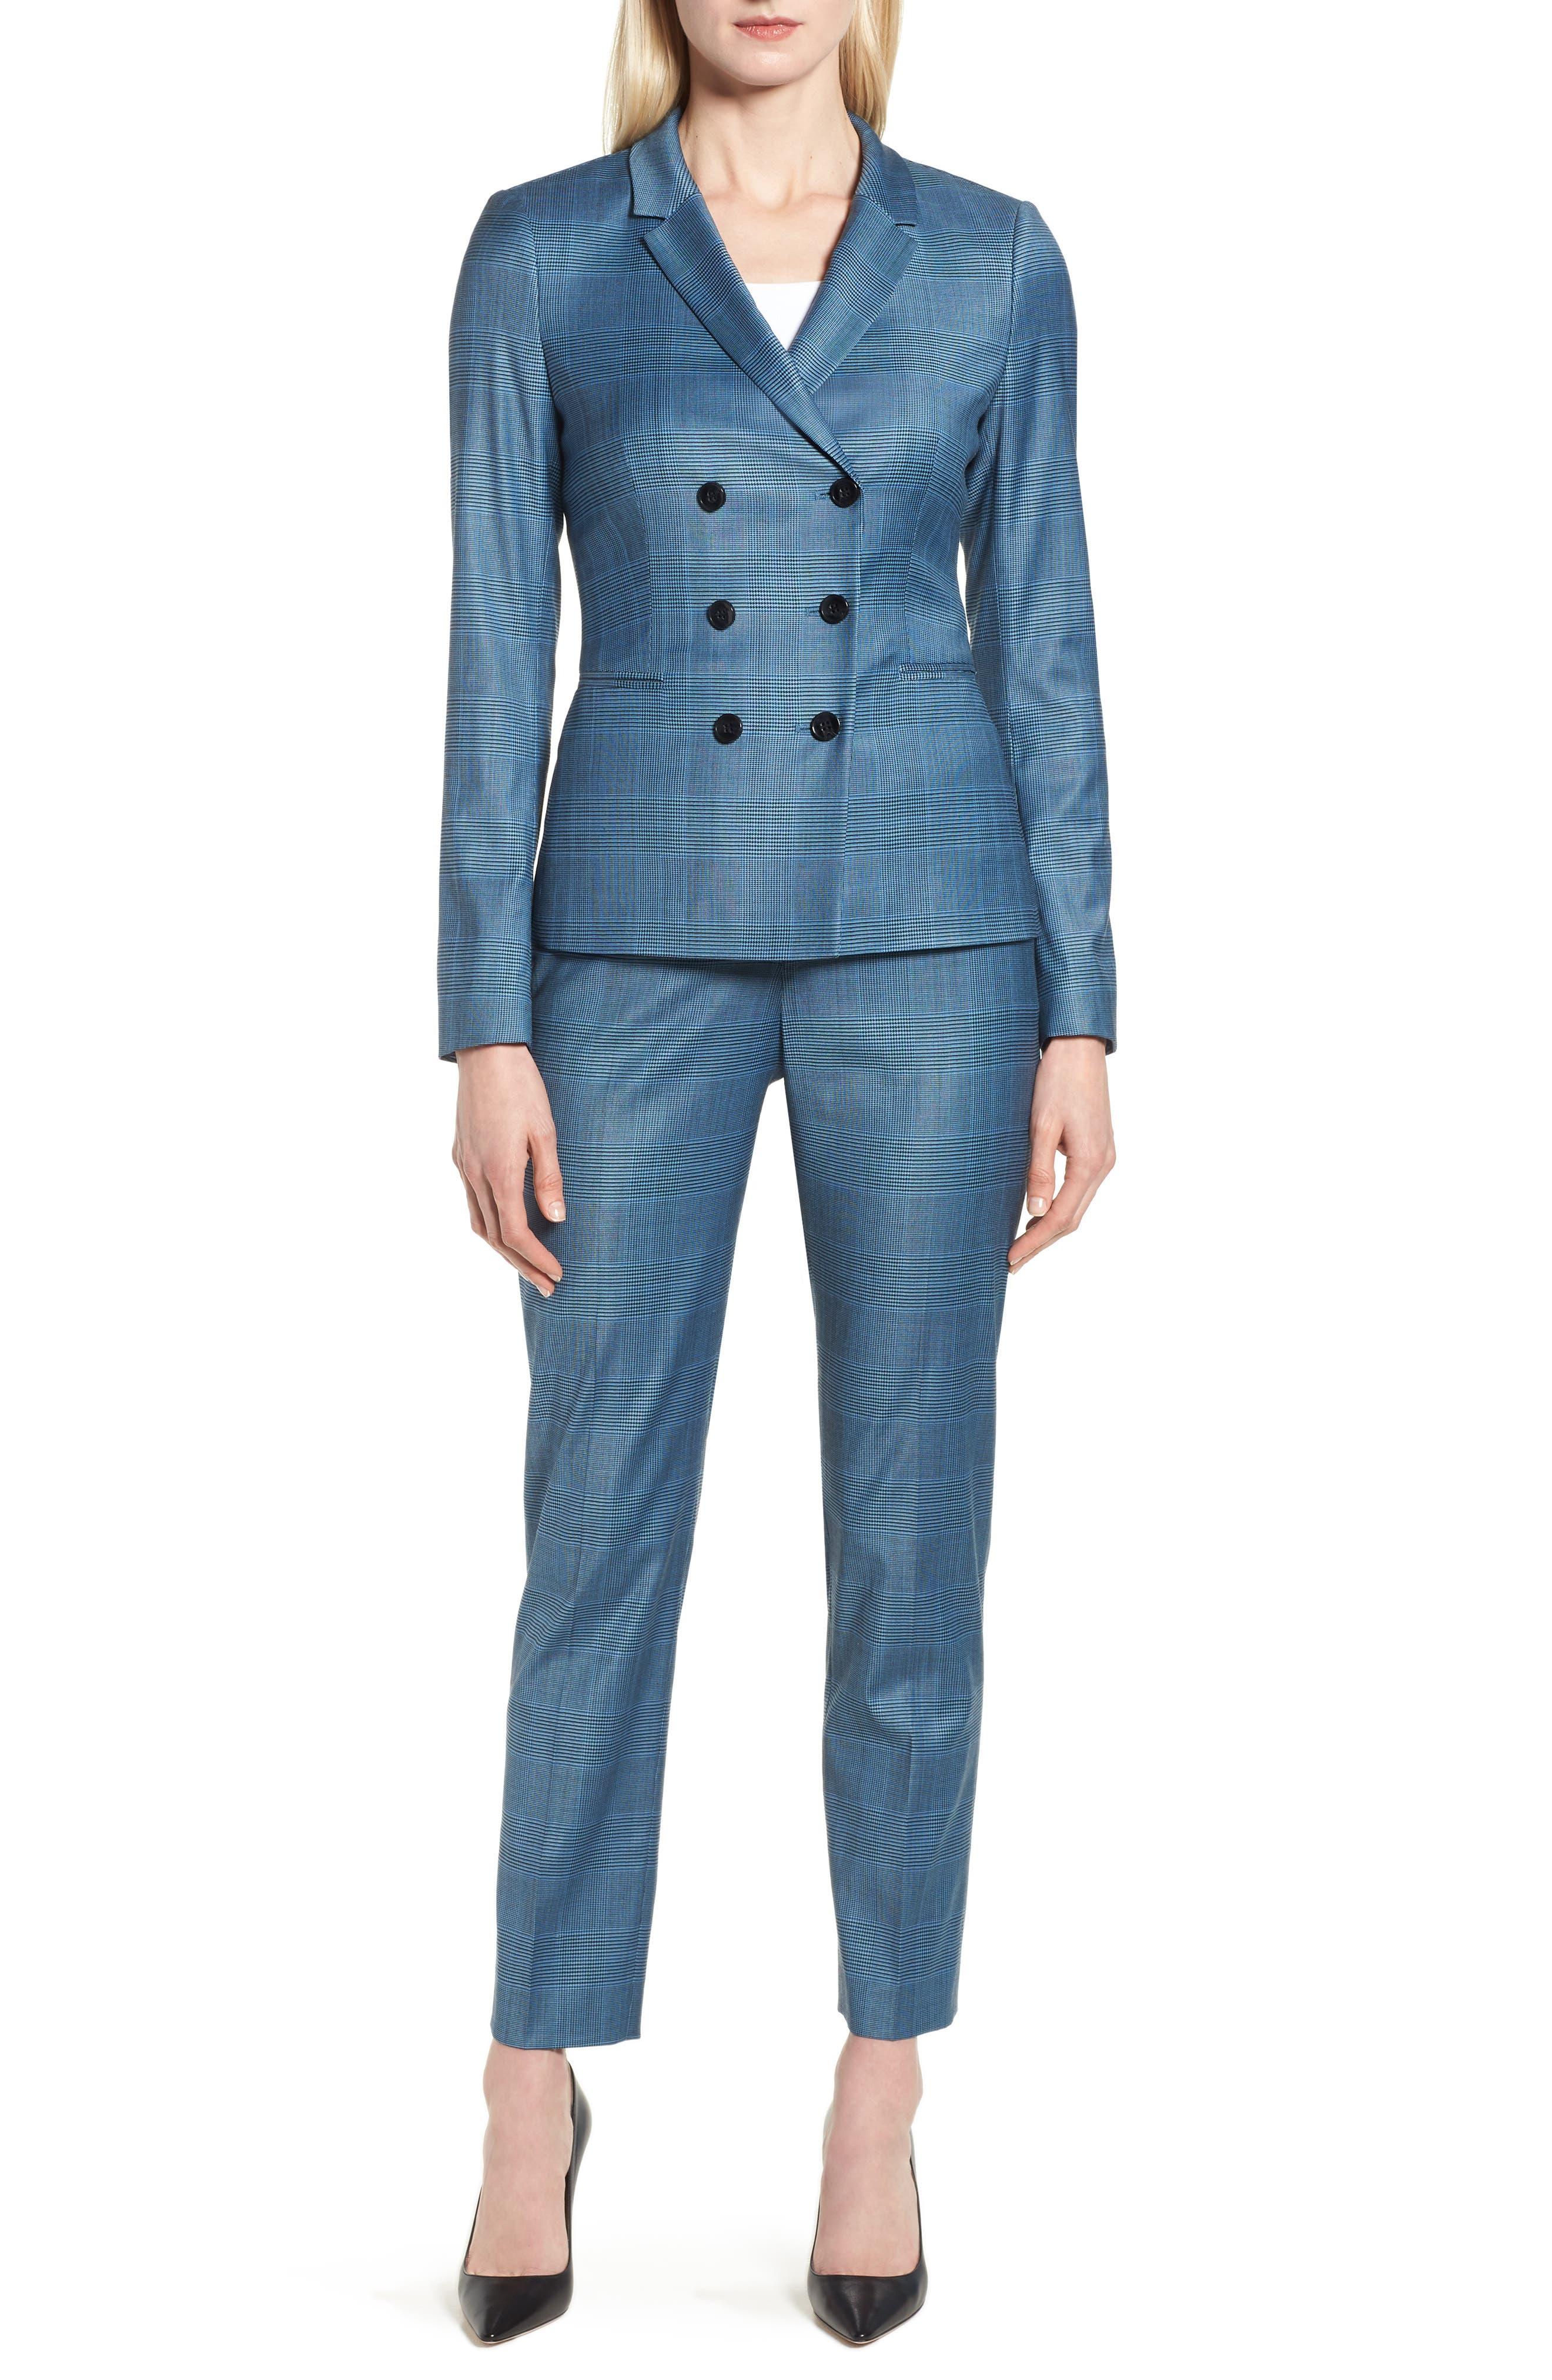 Jelaya Glencheck Double Breasted Suit Jacket,                             Alternate thumbnail 7, color,                             467